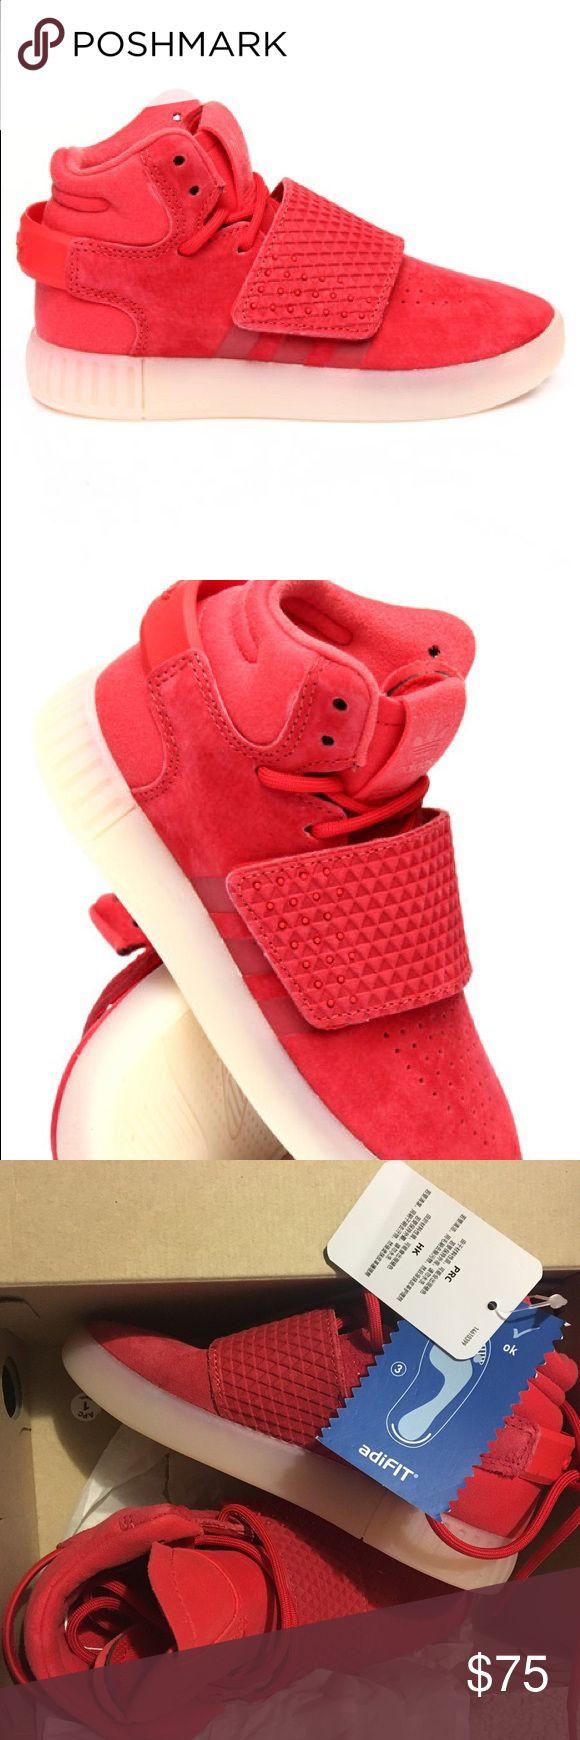 Adidas clipart kid shoe Tubular Adidas ideas New NWT